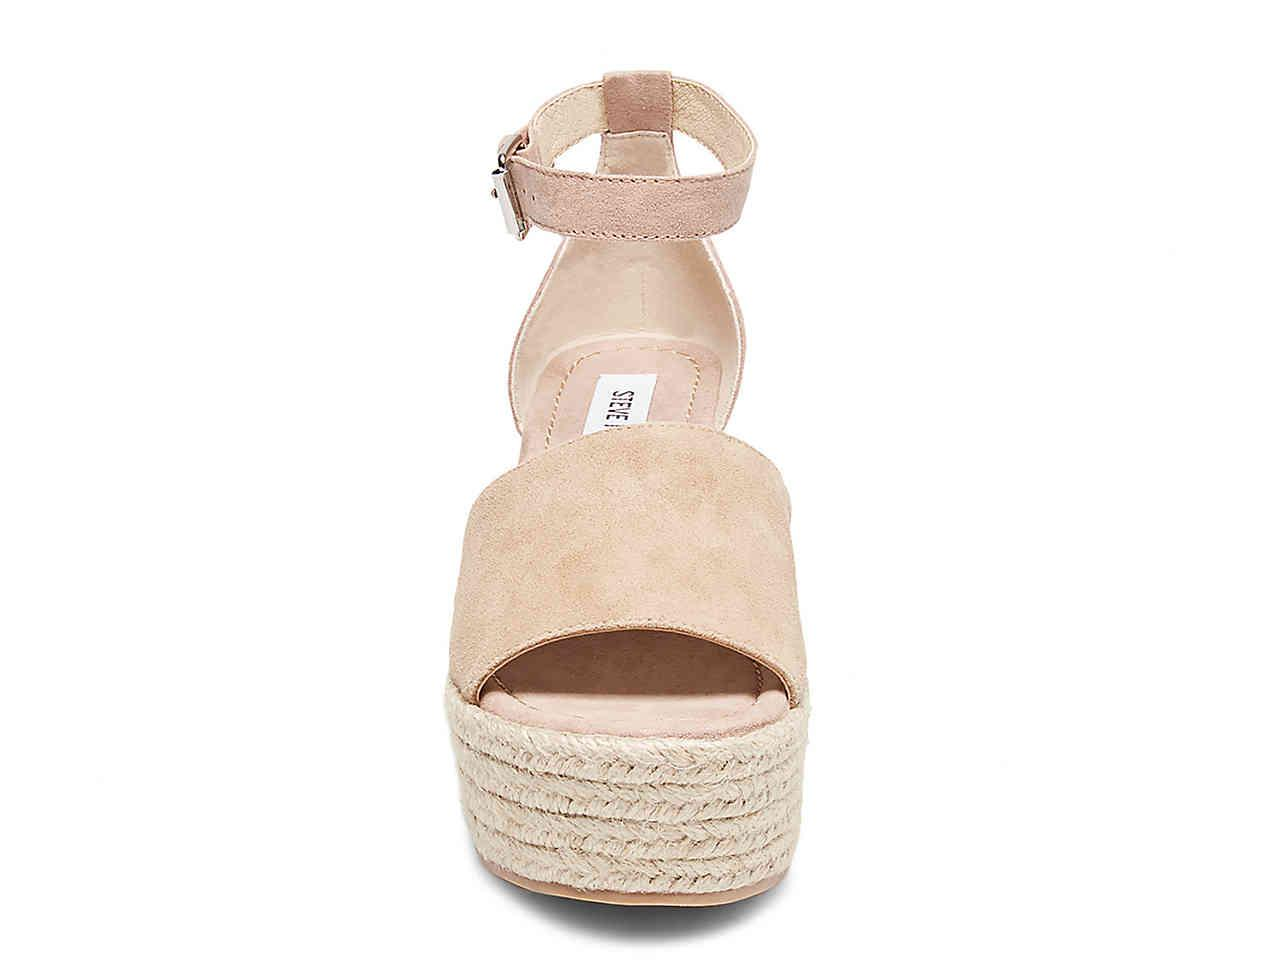 9641e4a5562b Lyst - Steve Madden Apolo Espadrille Wedge Sandal